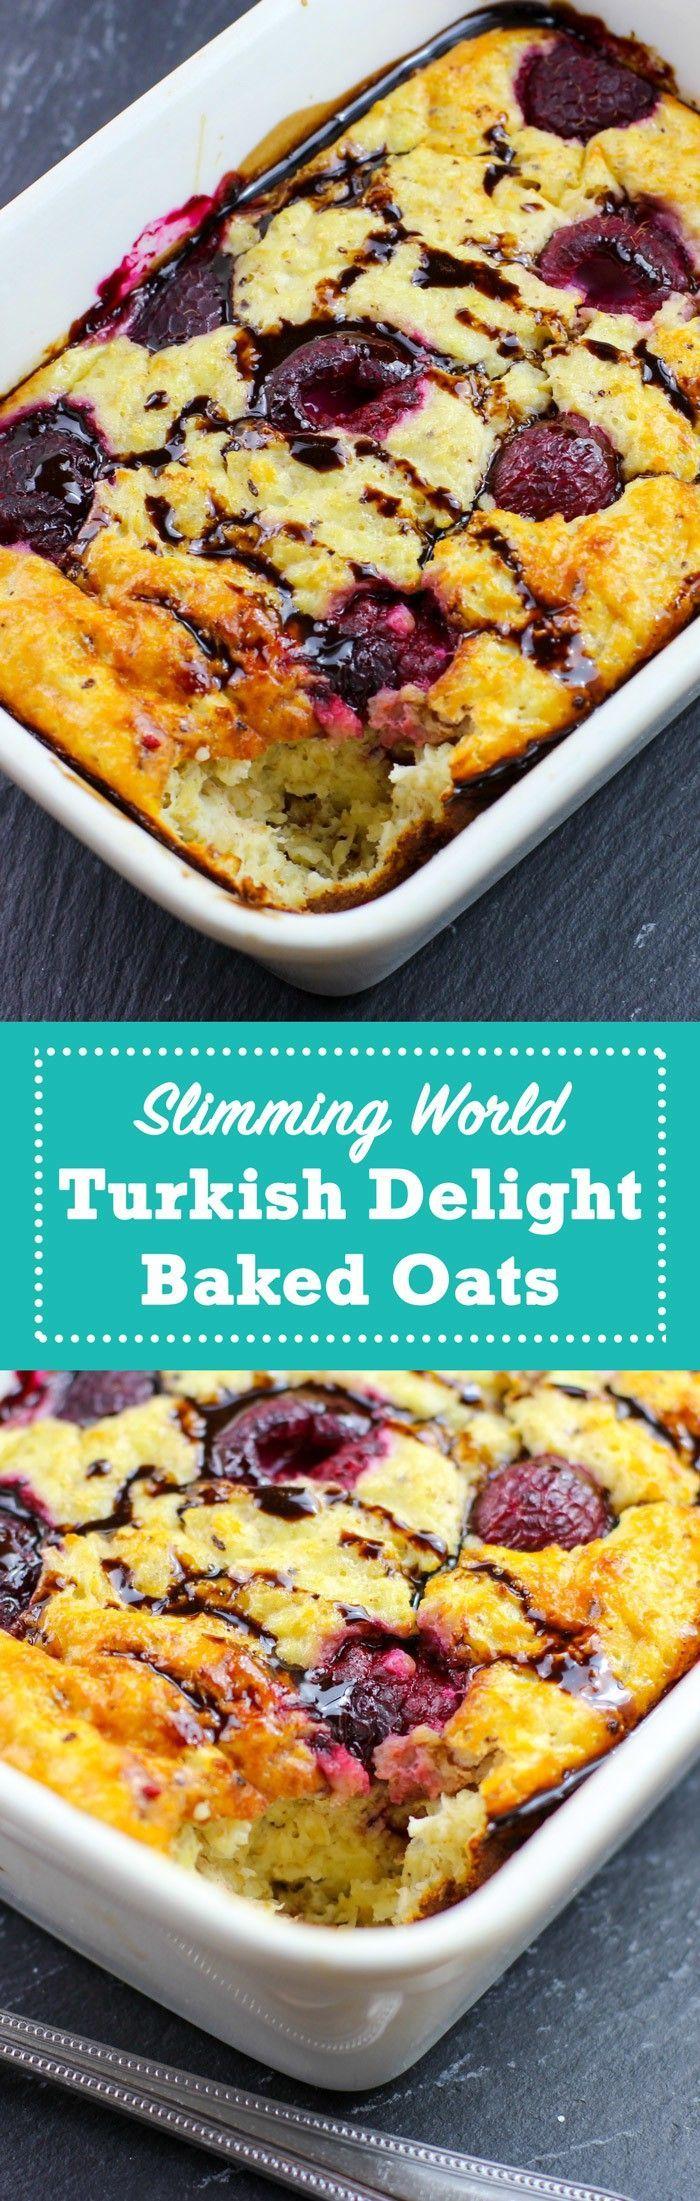 Turkish Delight Baked Oats